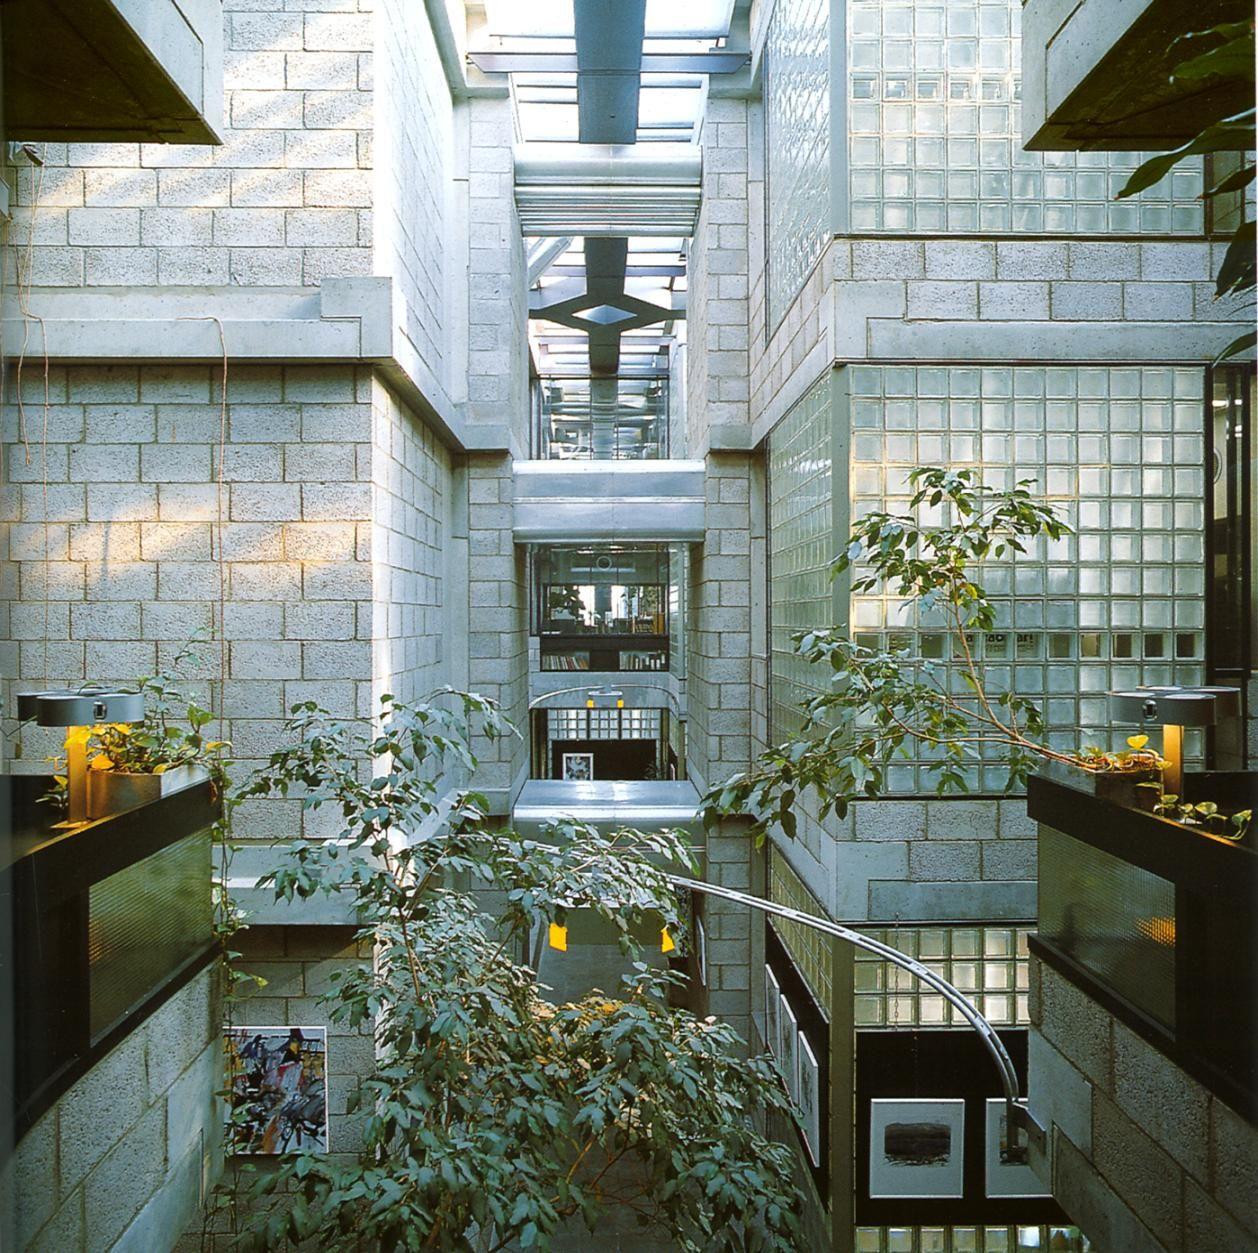 University Of Amsterdam Dorms: Centraal Beheer, Apeldoorn By Hermann Hertzberger